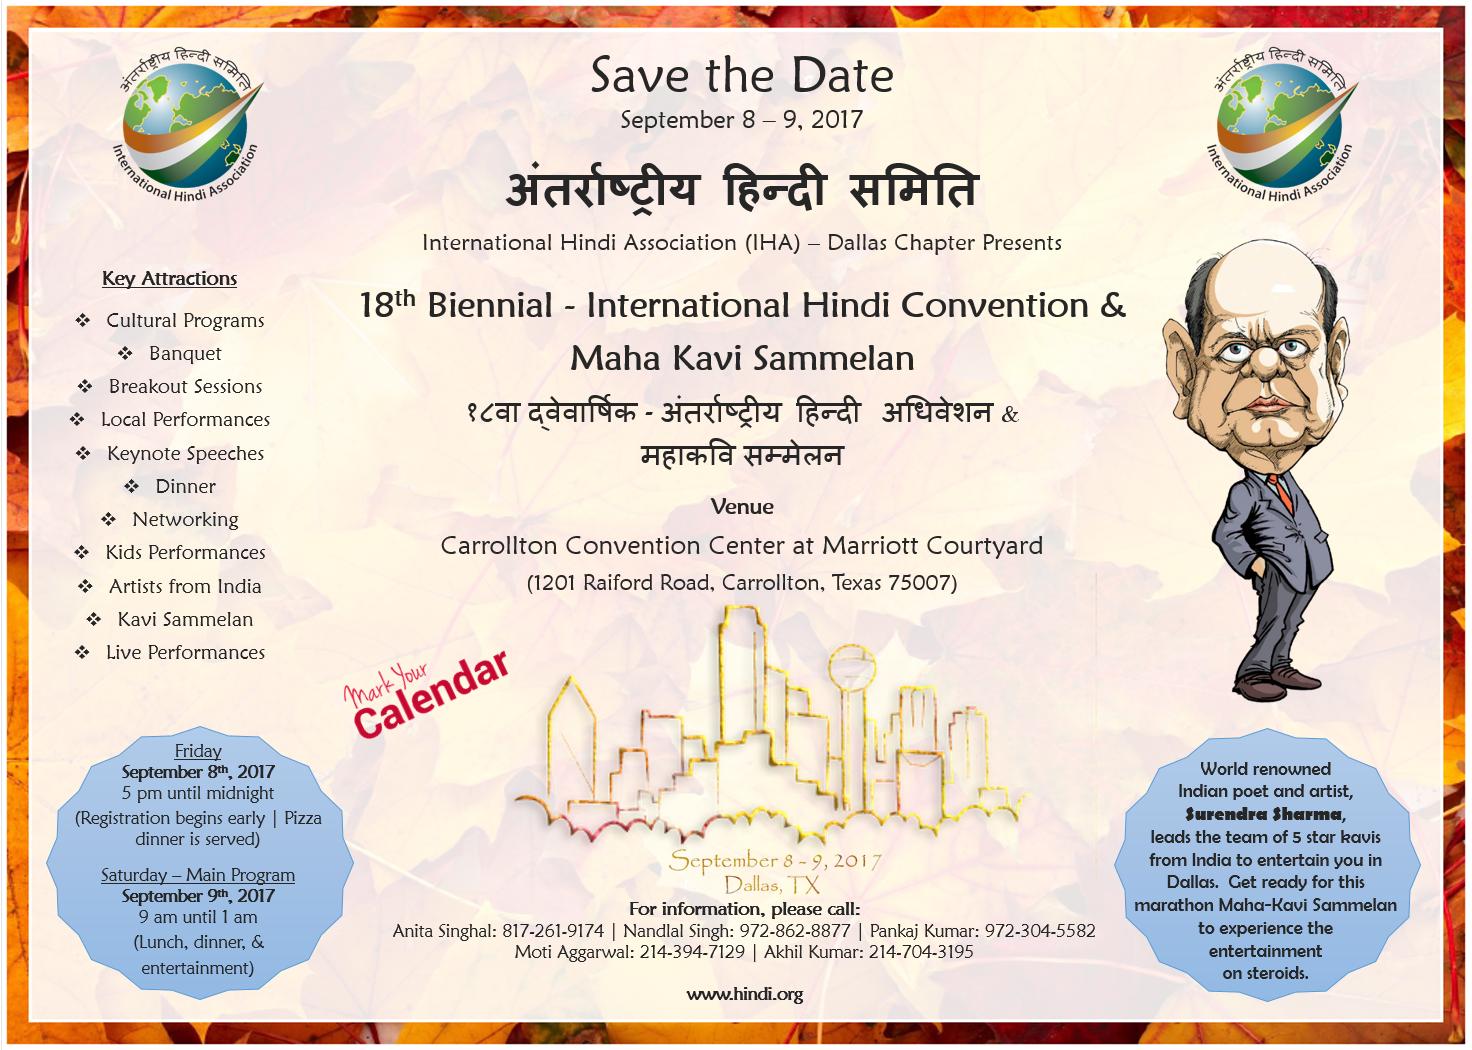 18th Biennial - International Hindi Convention & Maha Kavi Sammelam